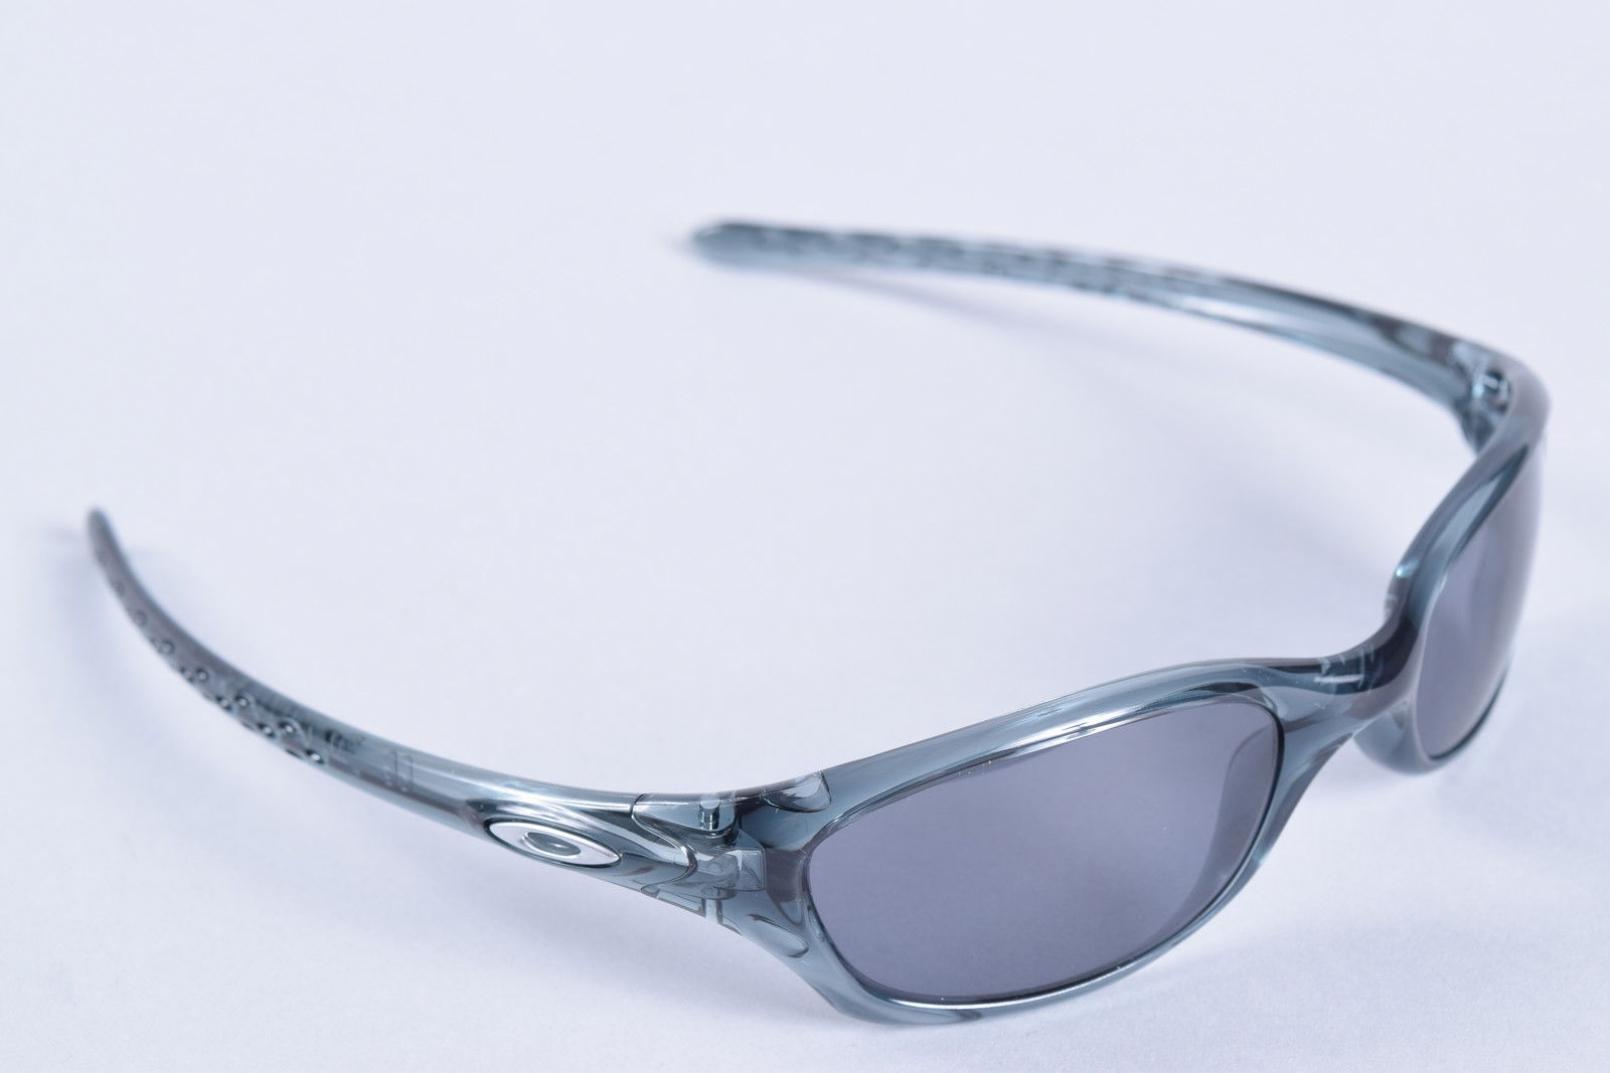 8f4d11964c4 Oakley Fives 2.0 Sunglasses Ebay « Heritage Malta